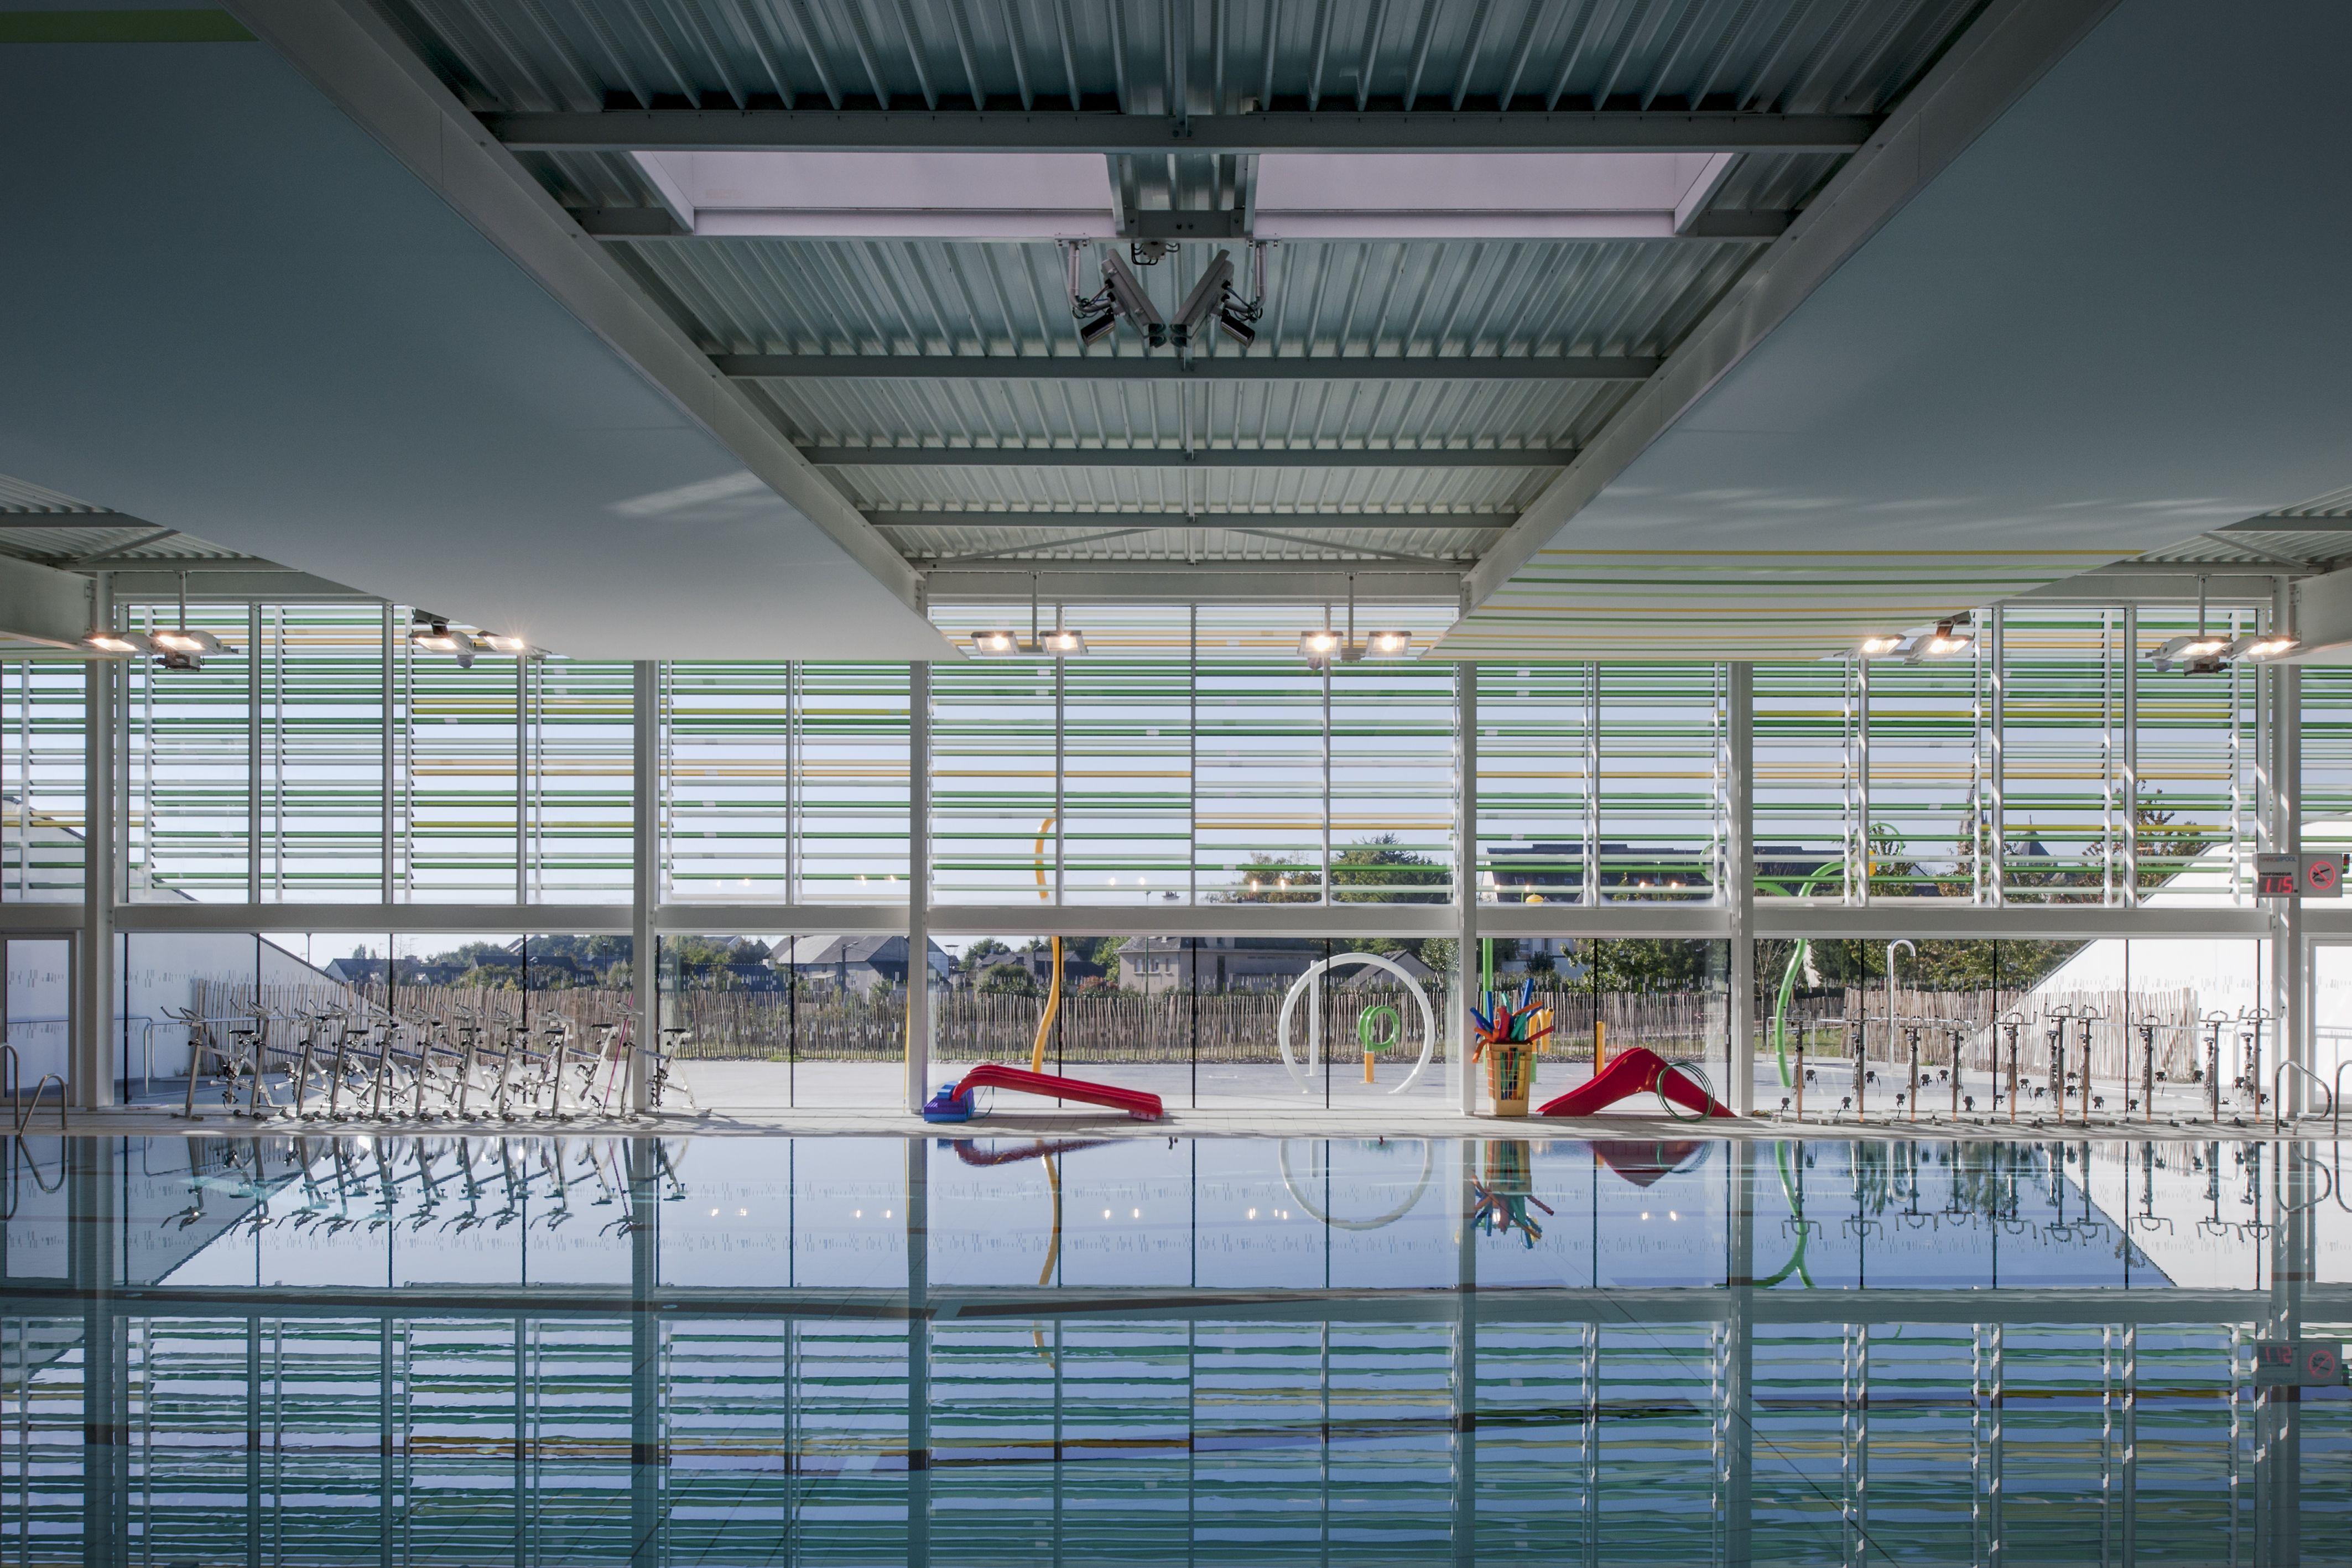 Centre Aquatique Janze C Patrick Miara Piscine Aquatique